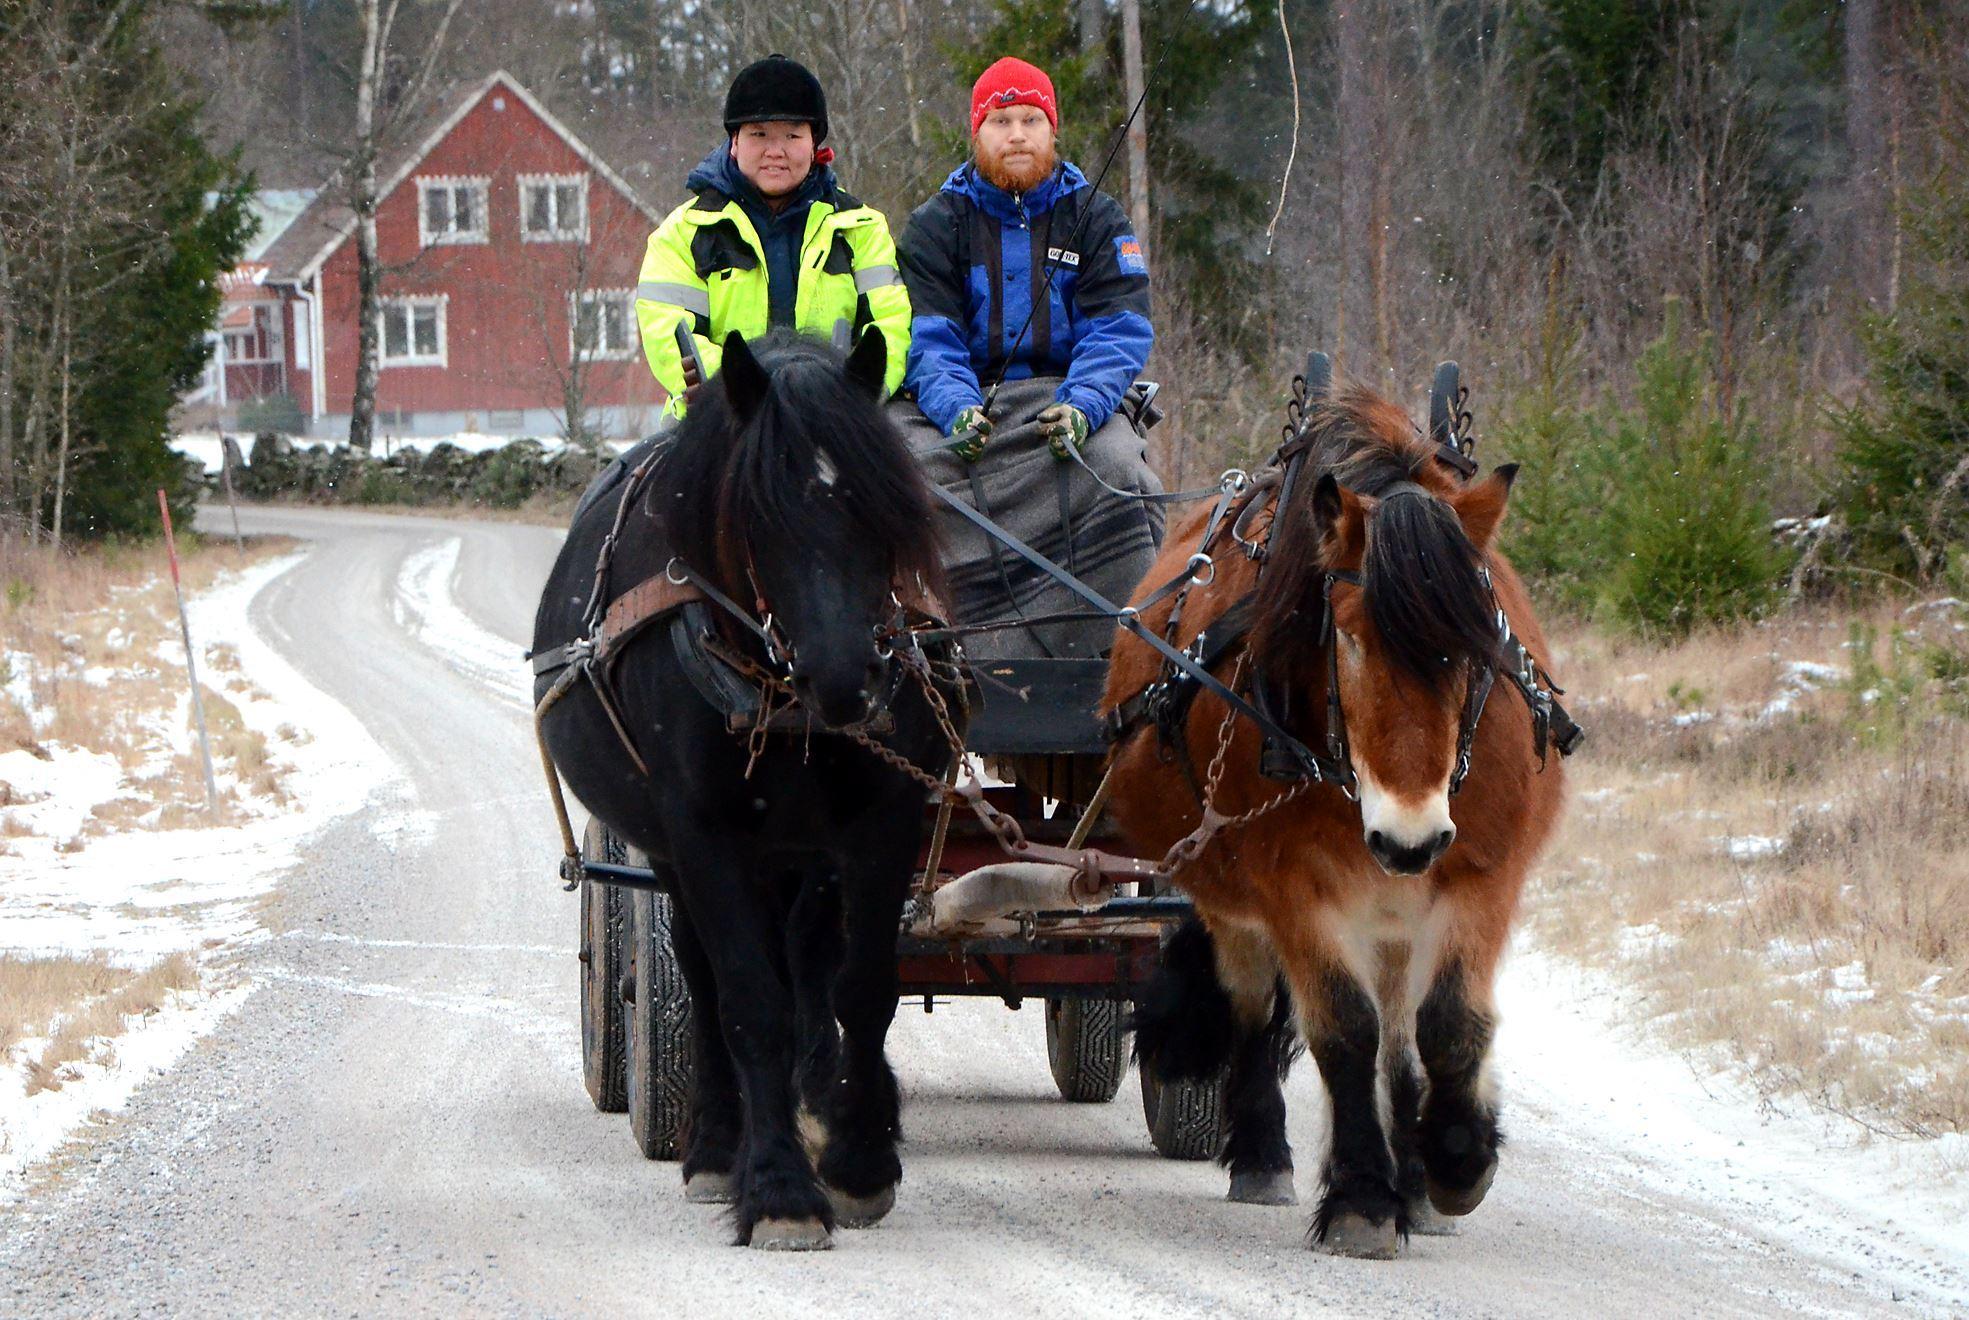 Horses: Fyrfota hästkraft - Tours with horse and carrige or sleigh